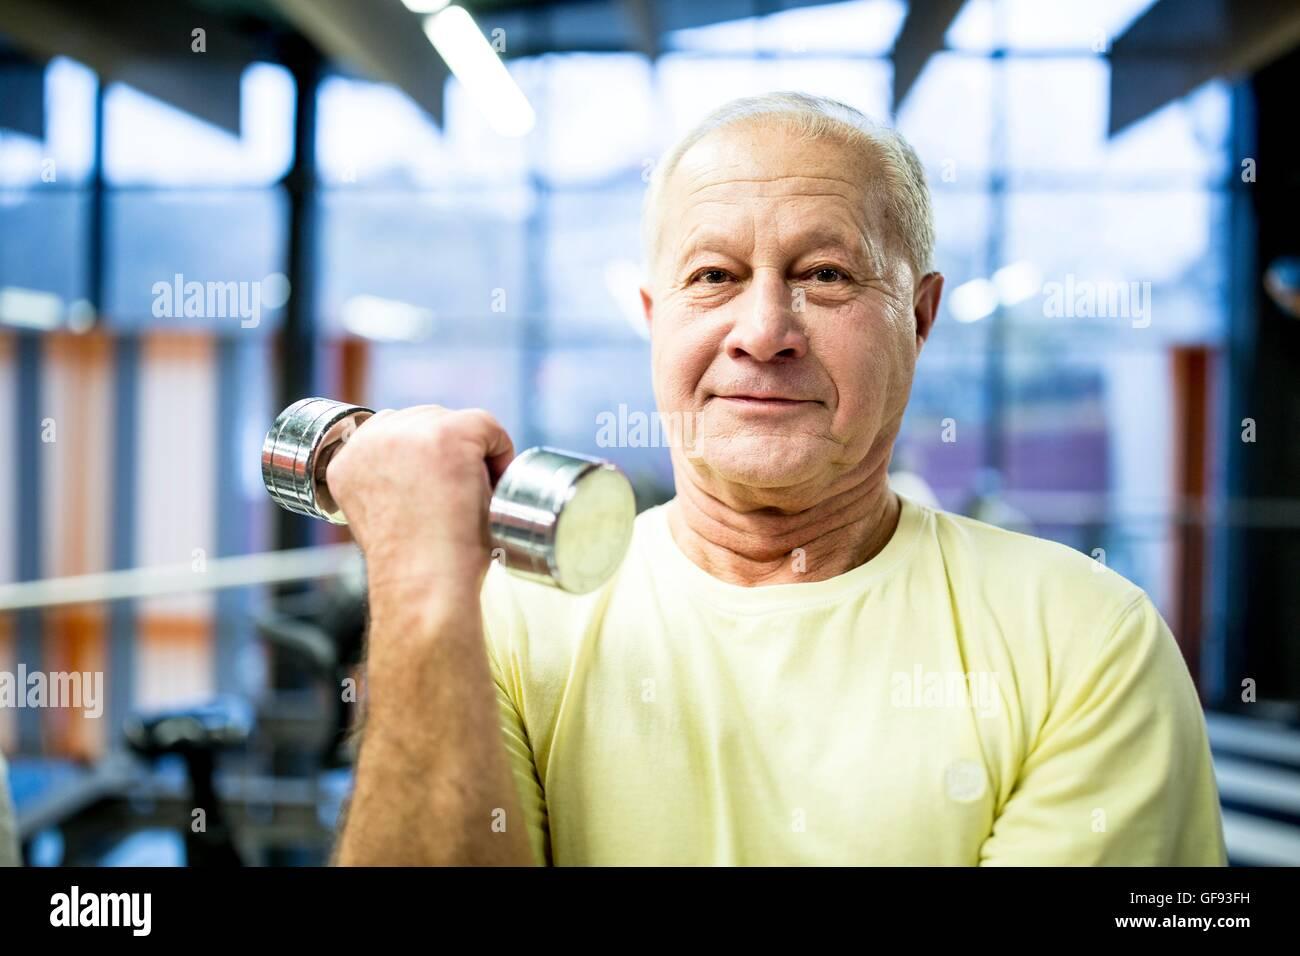 PROPERTY RELEASED. MODEL RELEASED. Portrait senior man holding dumbbell in gym. - Stock Image